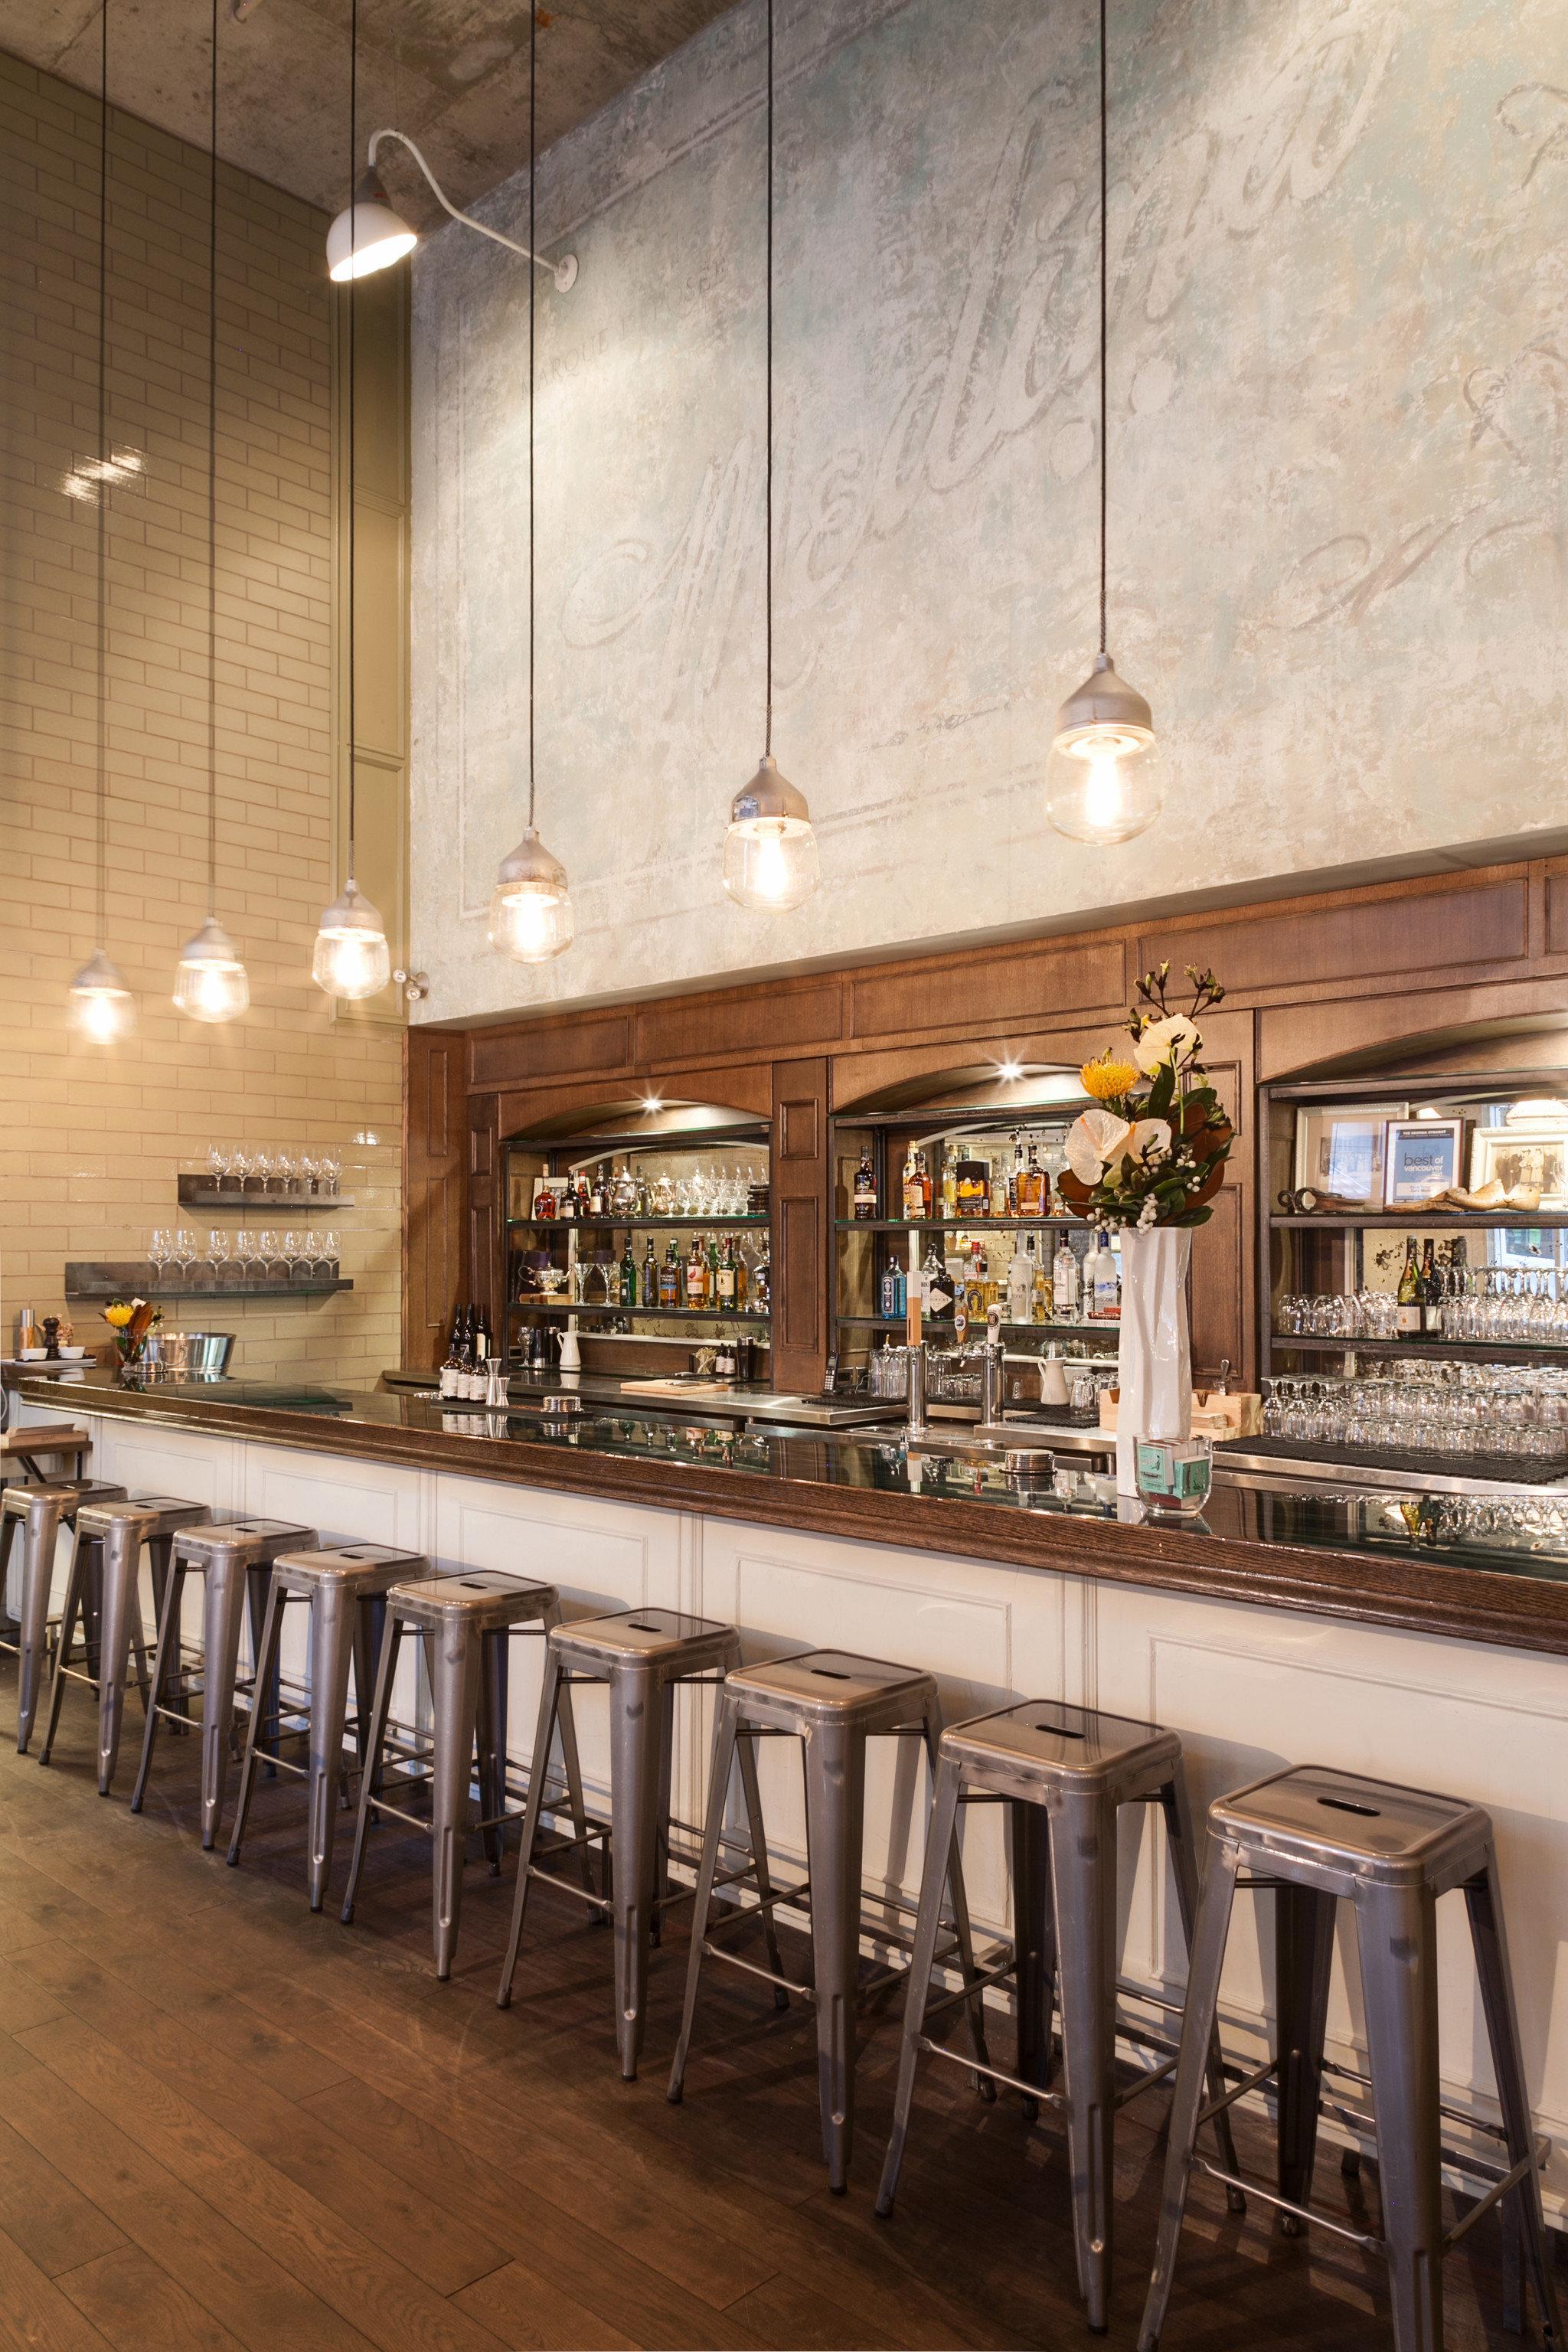 Trip Ideas indoor floor room restaurant interior design estate lighting wood Bar counter meal Design long several dining room